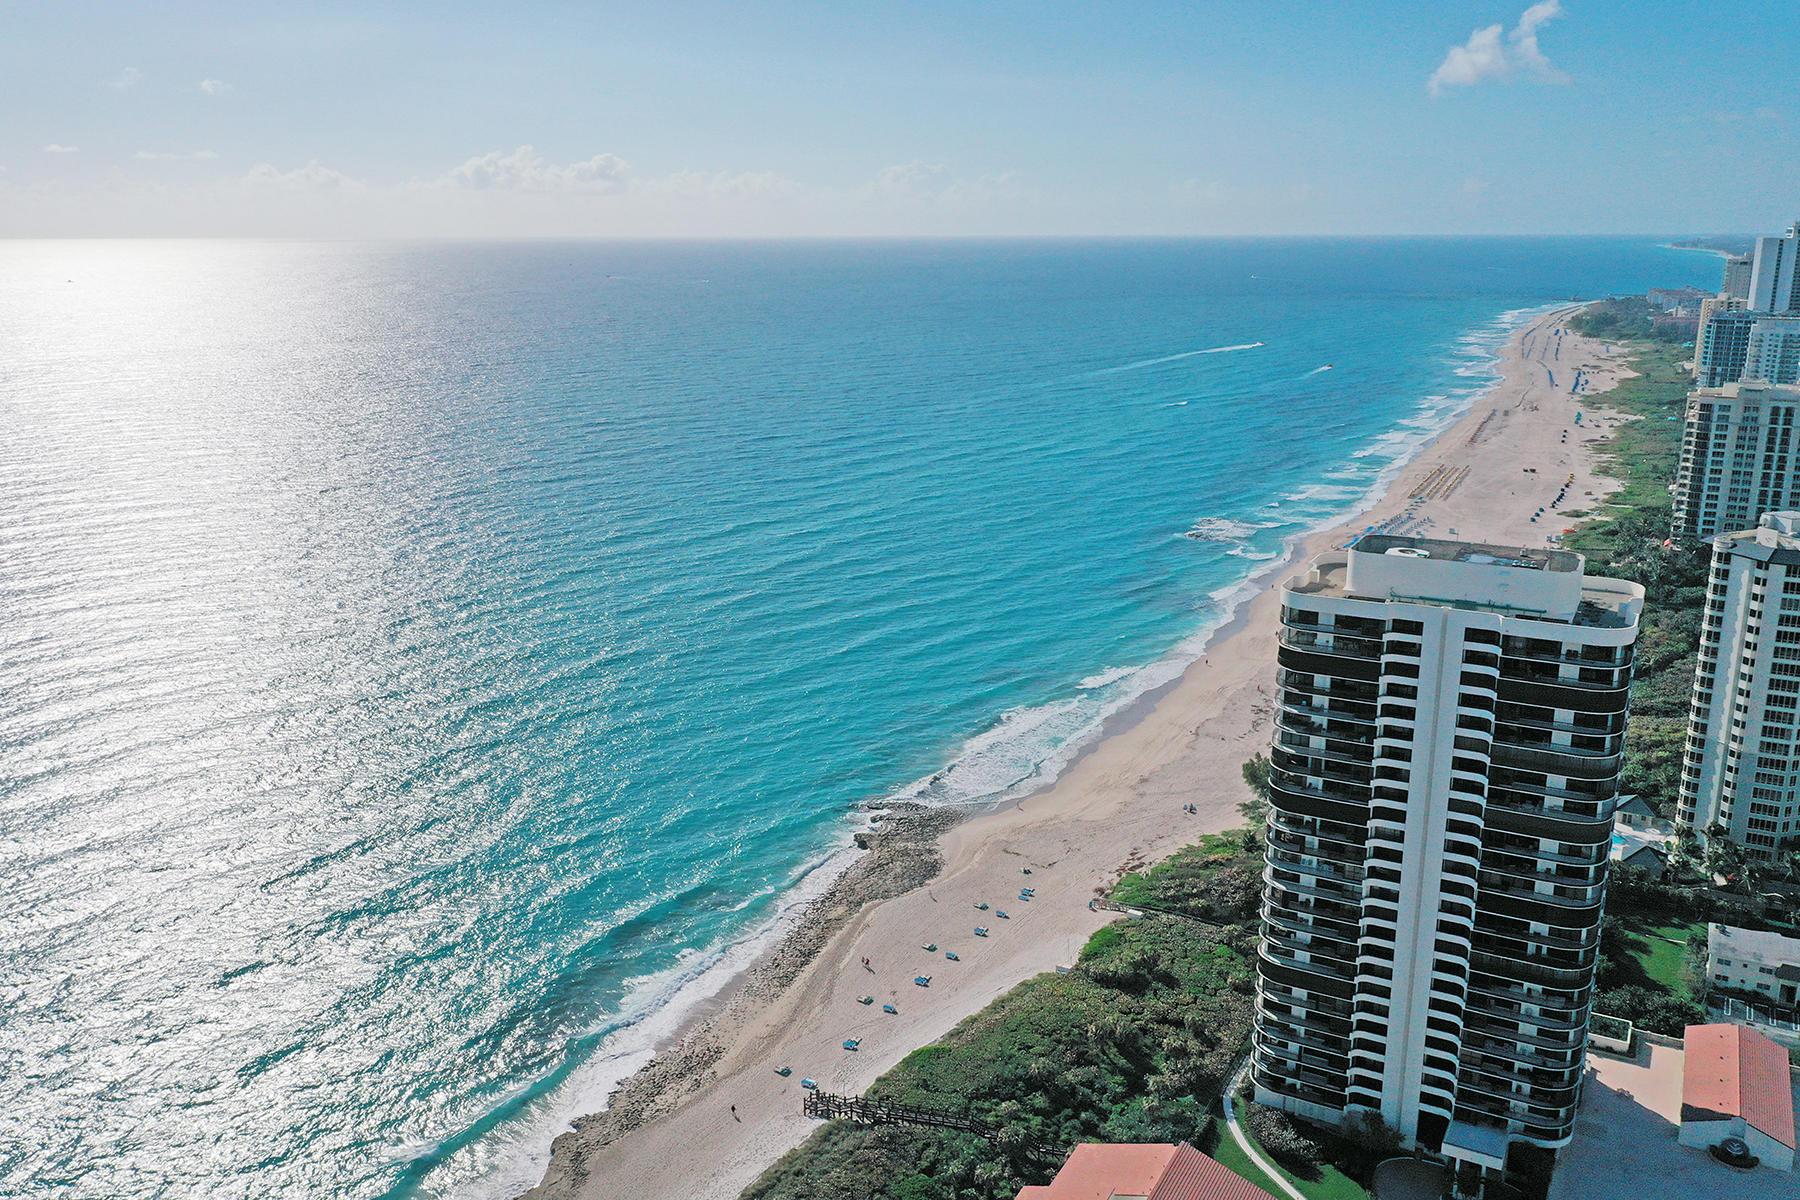 4000 N Ocean Drive, 703 - Singer Island, Florida